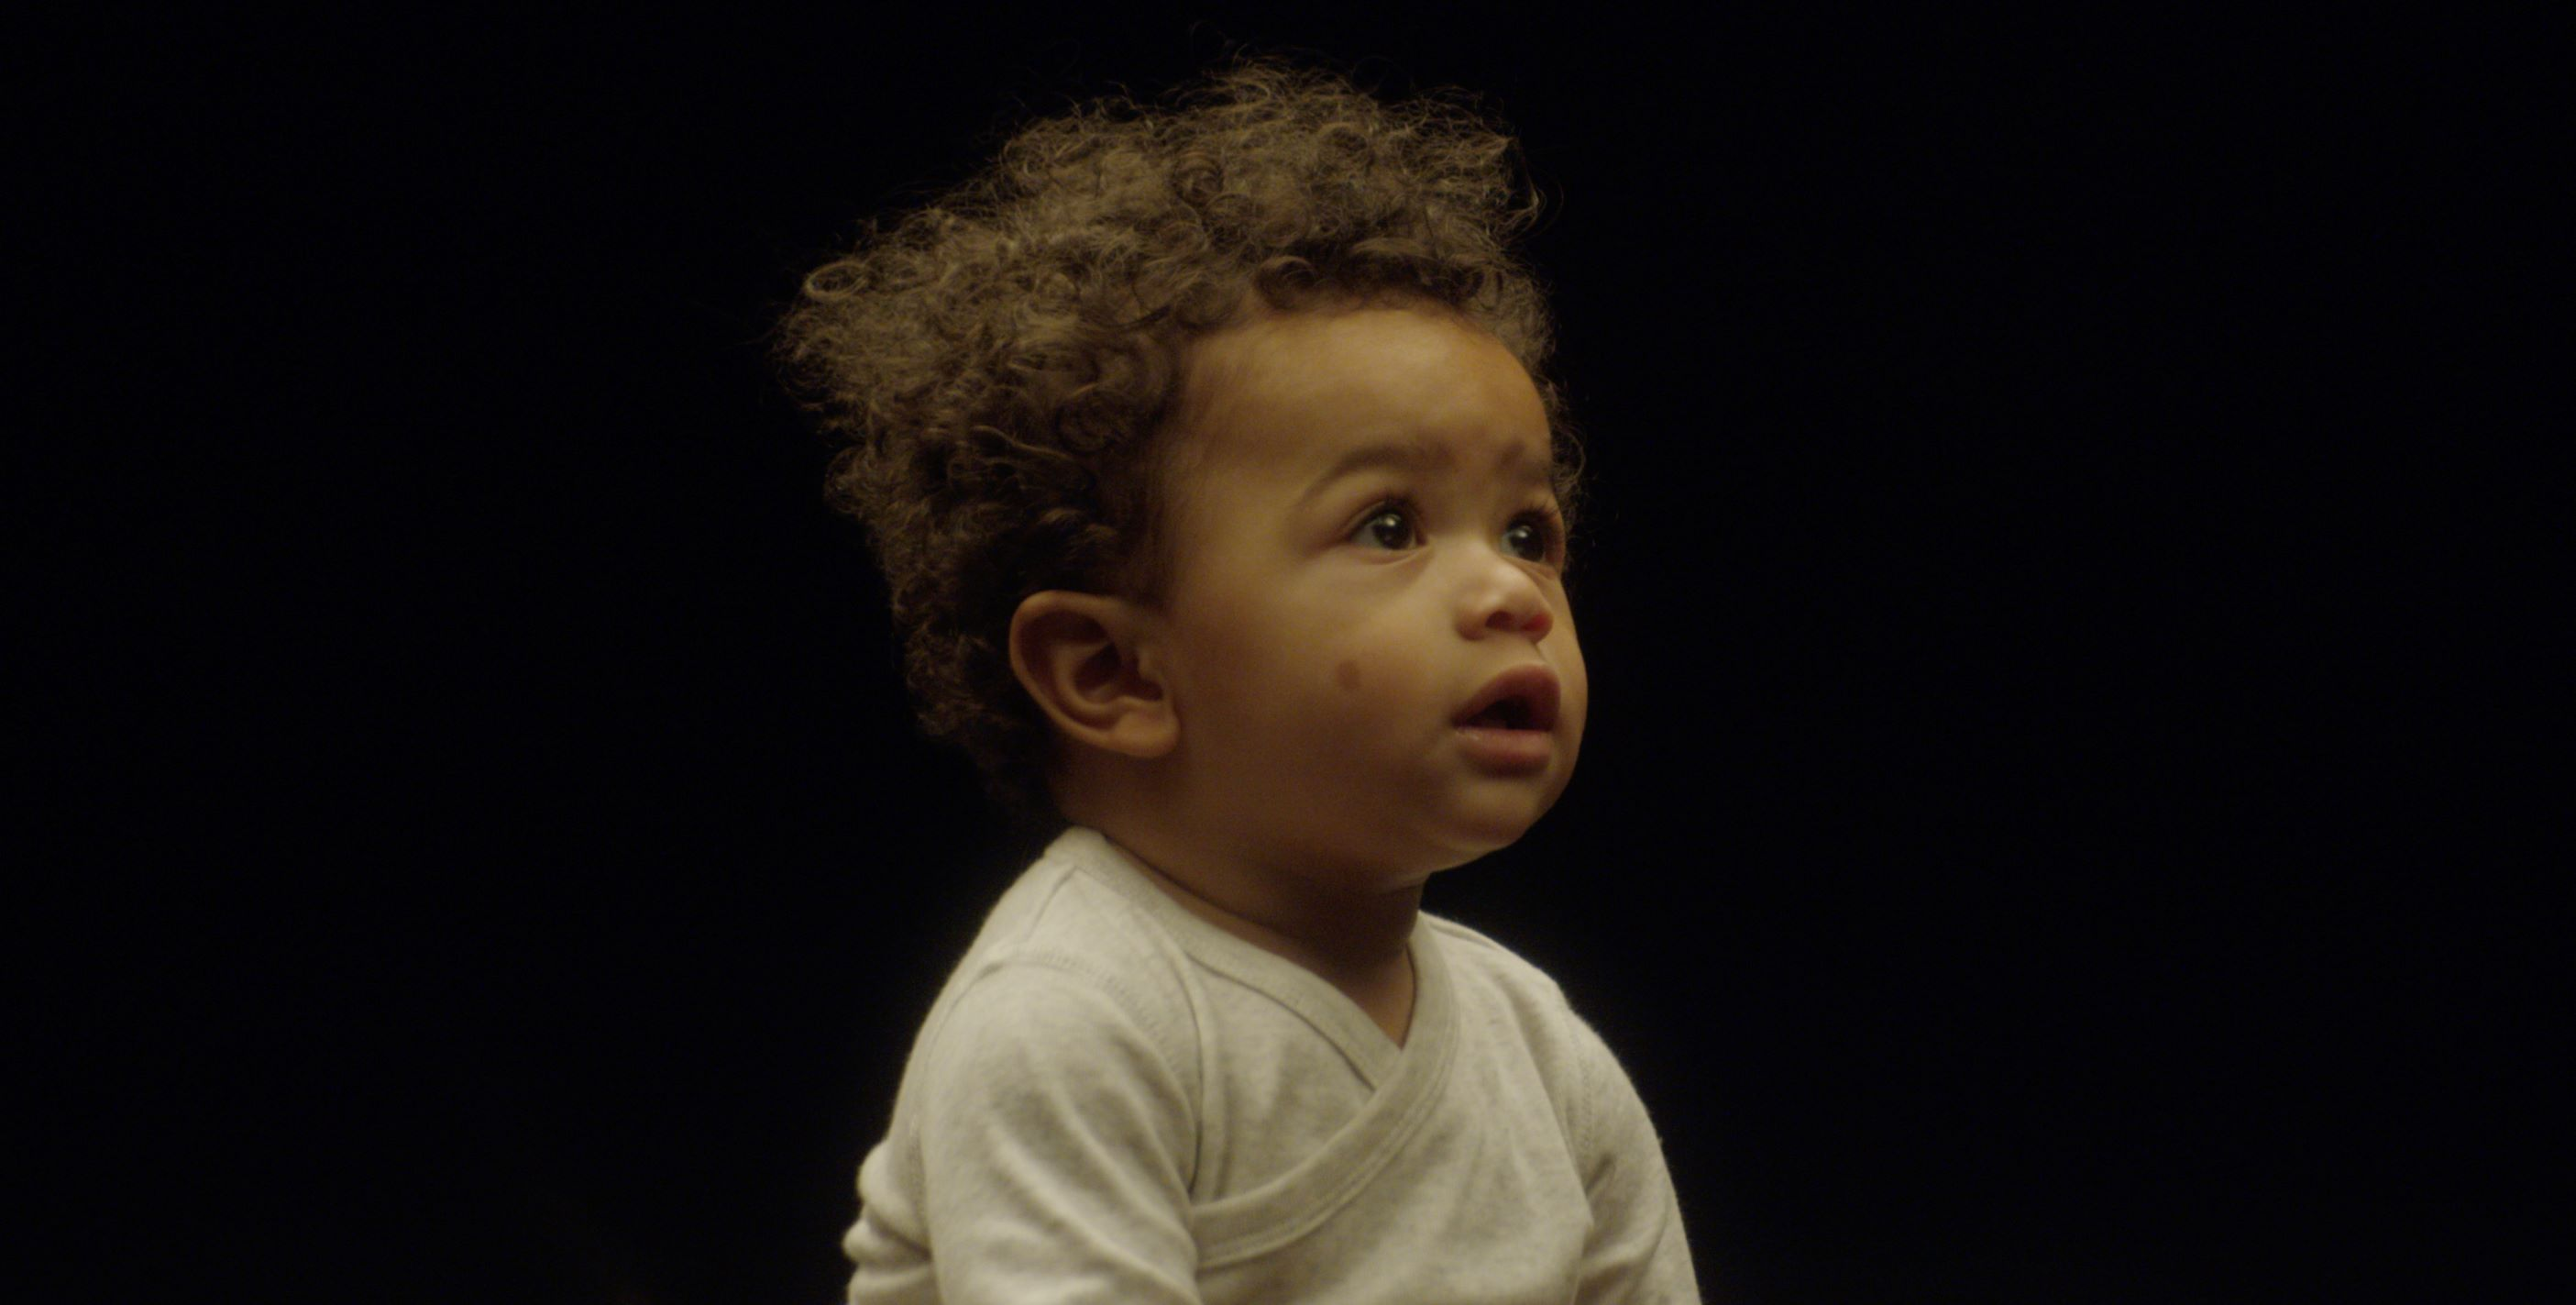 No Small Matter baby